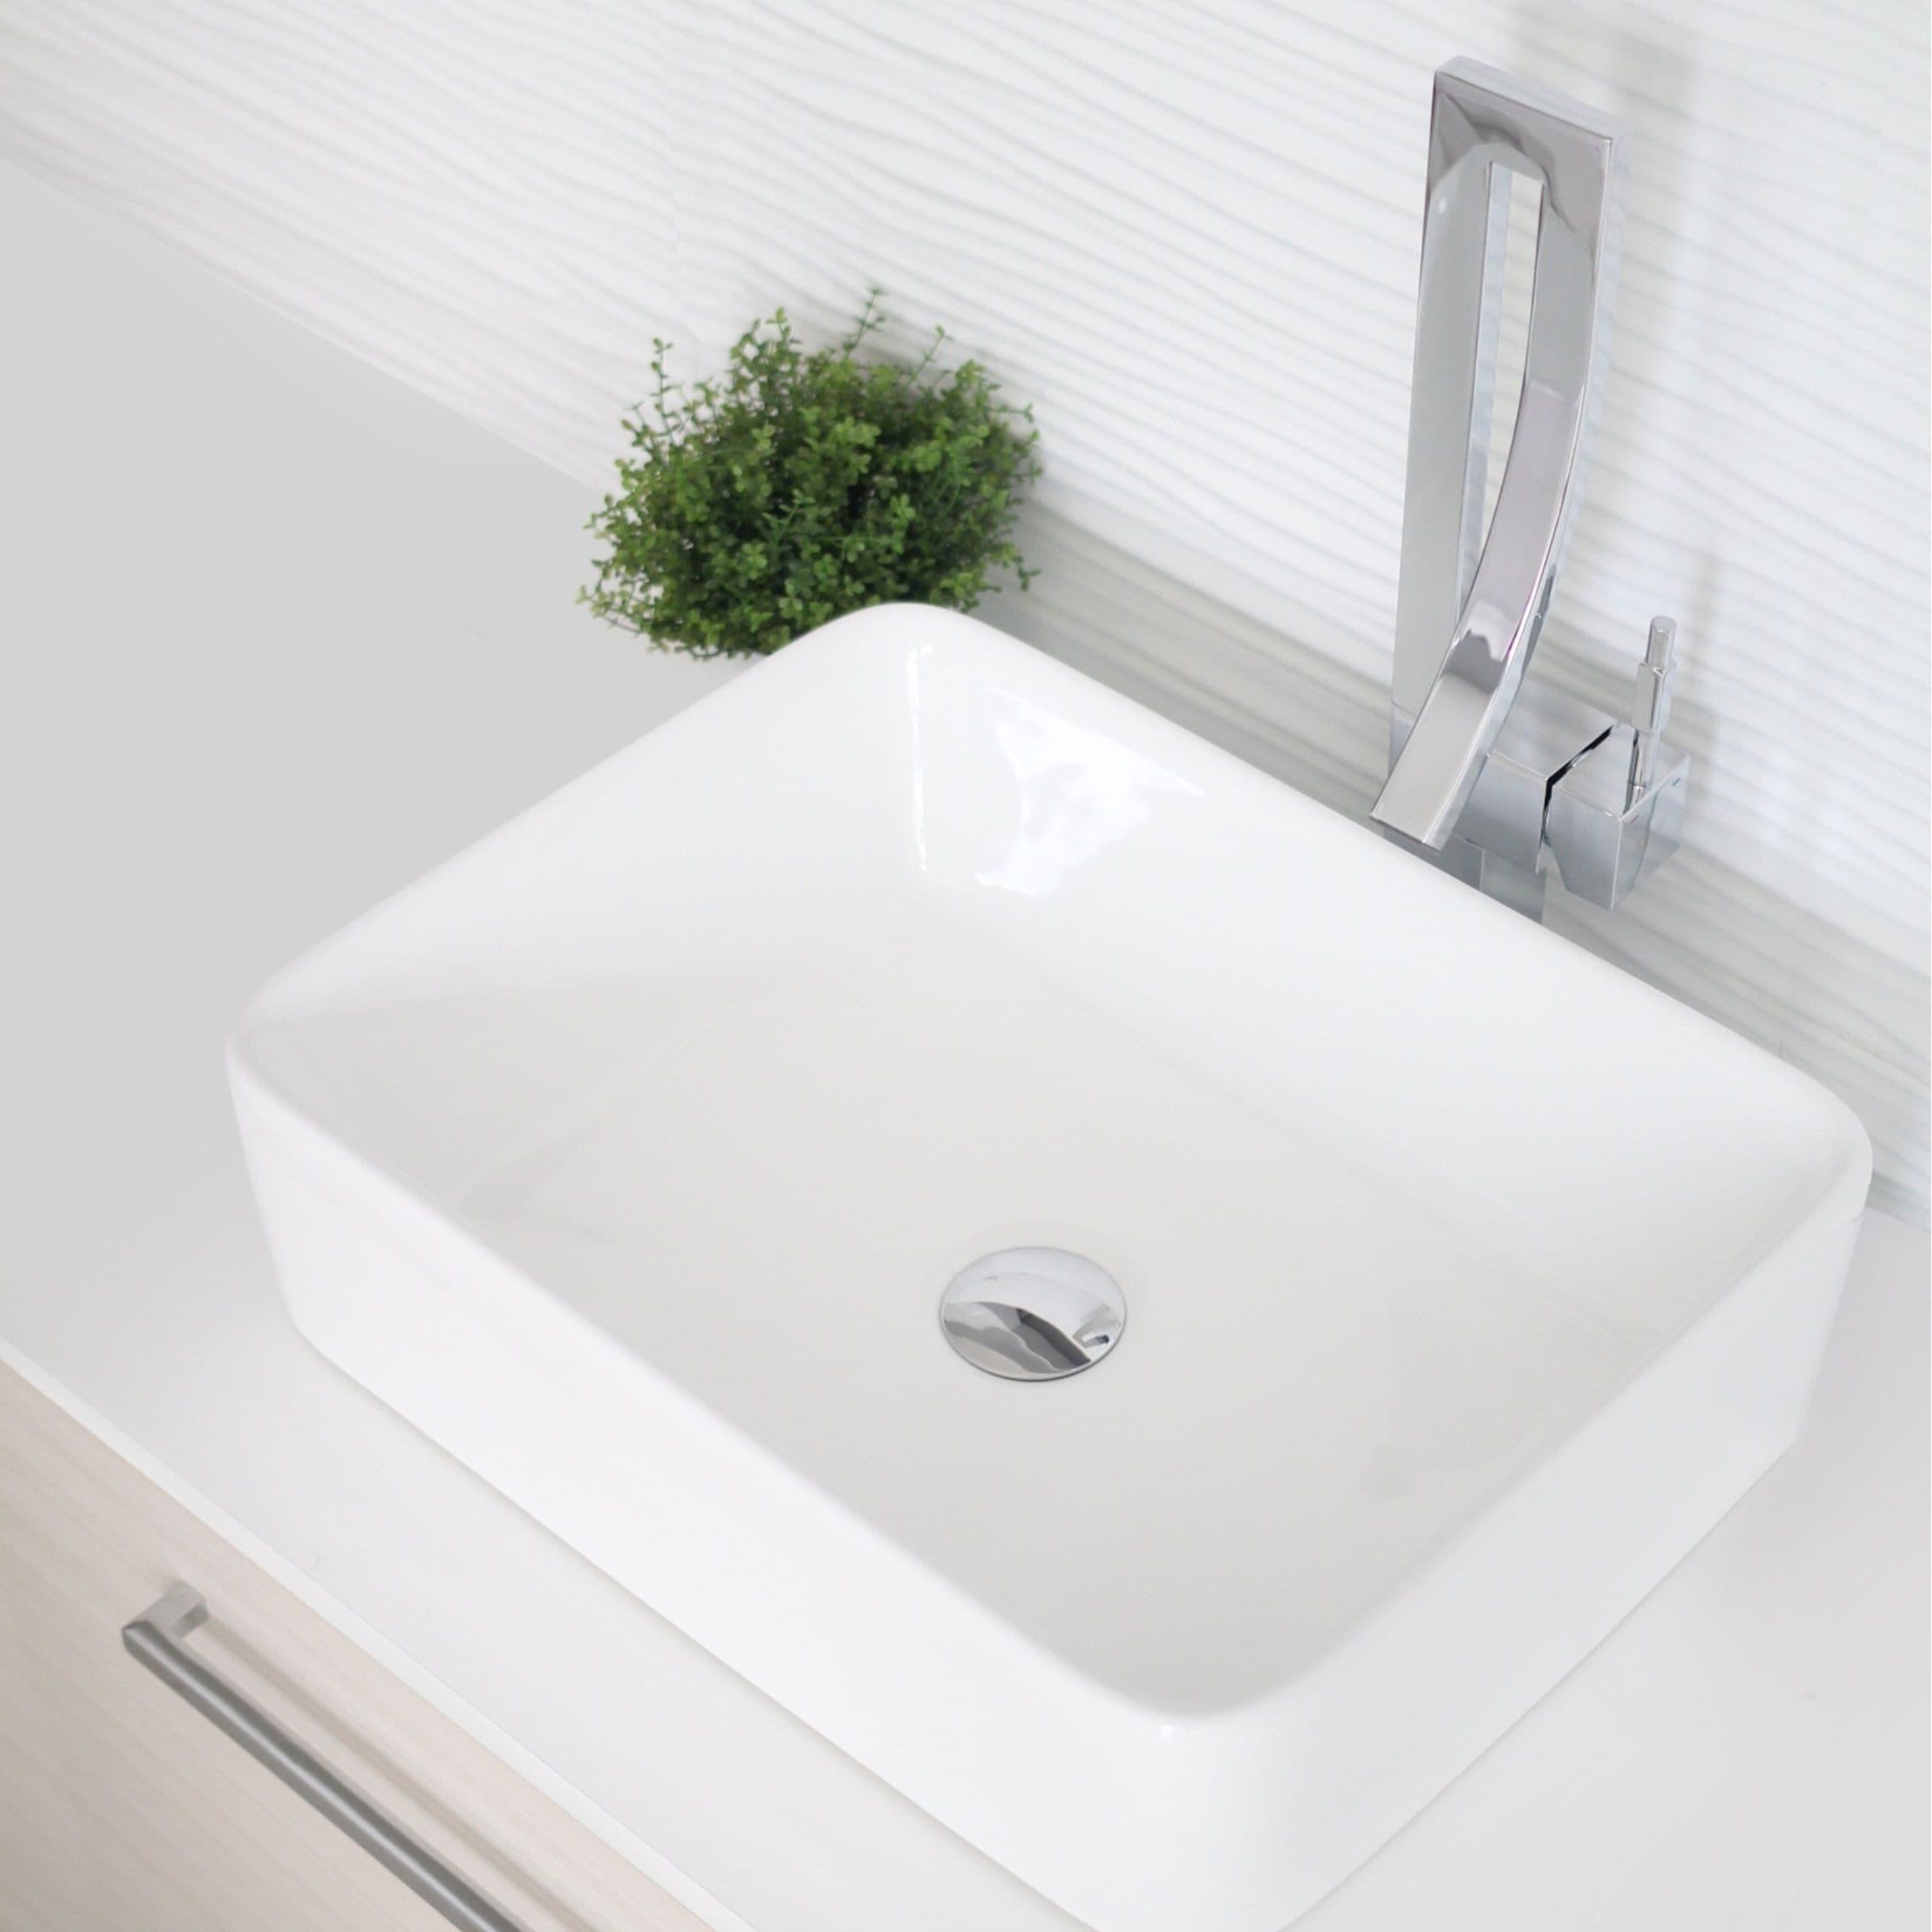 Stylish 18 Inch White Rectangular Ceramic Vessel Bathroom Sink Overstock 29787915